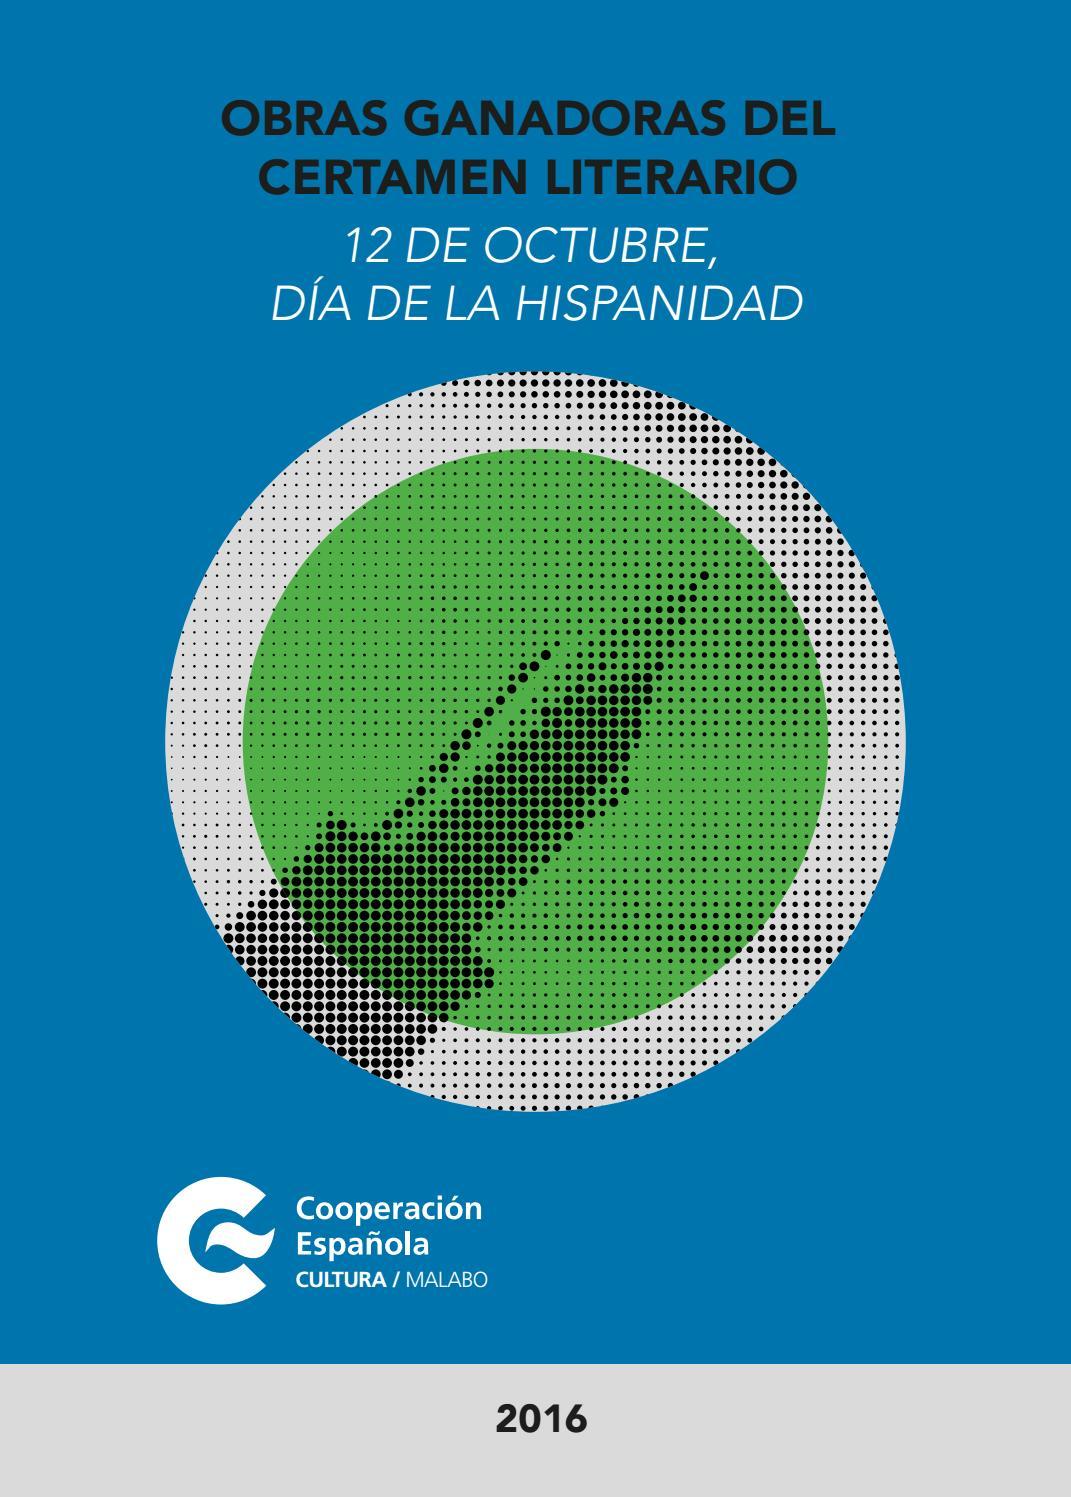 Certamen literario 2016 by Centro Cultural de España en Malabo - issuu